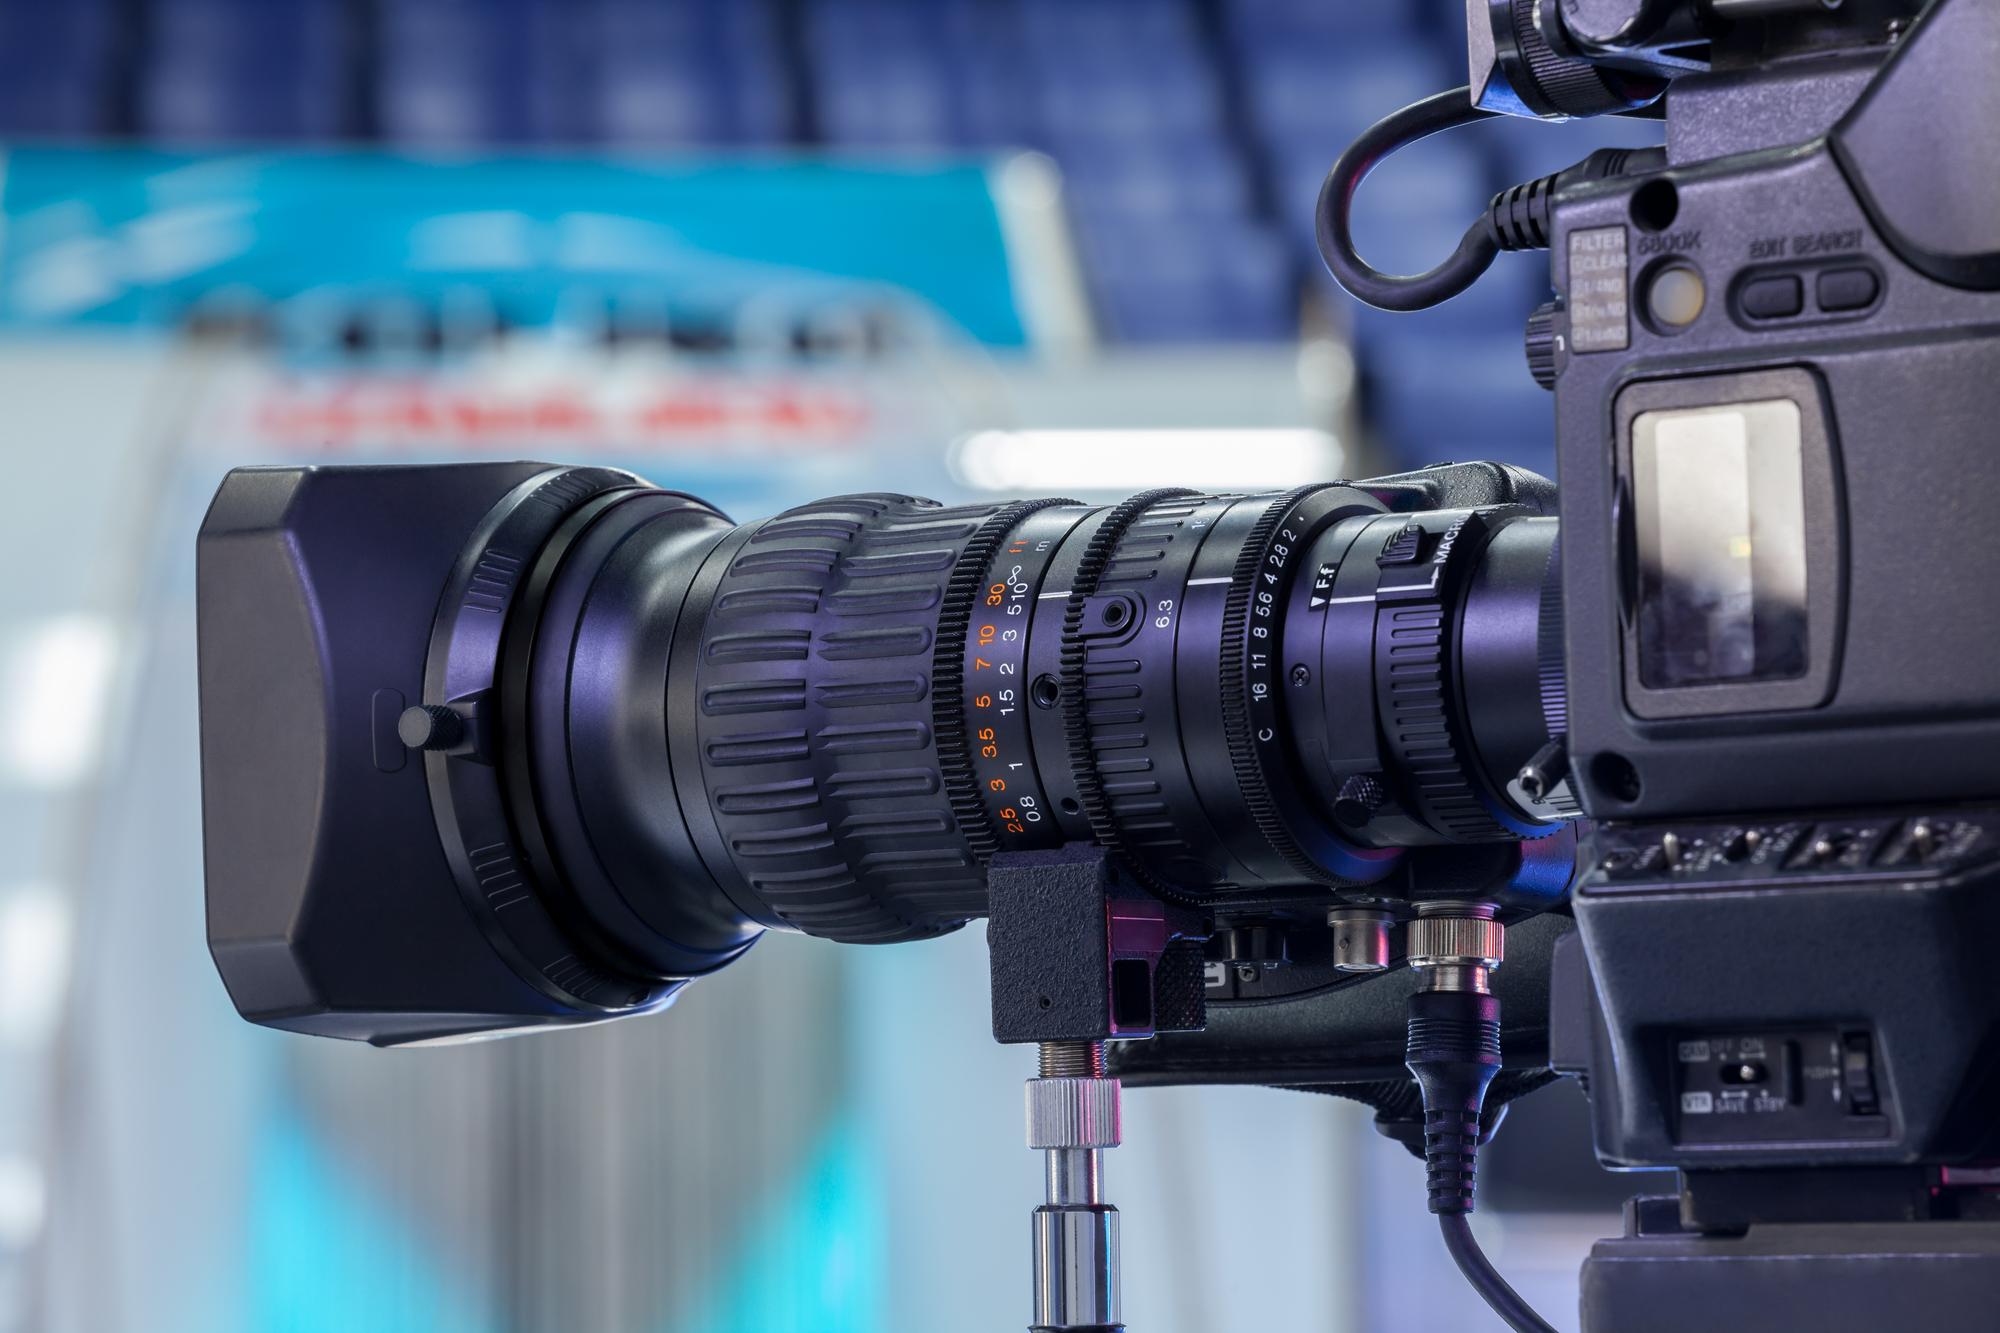 Multimedia Rights